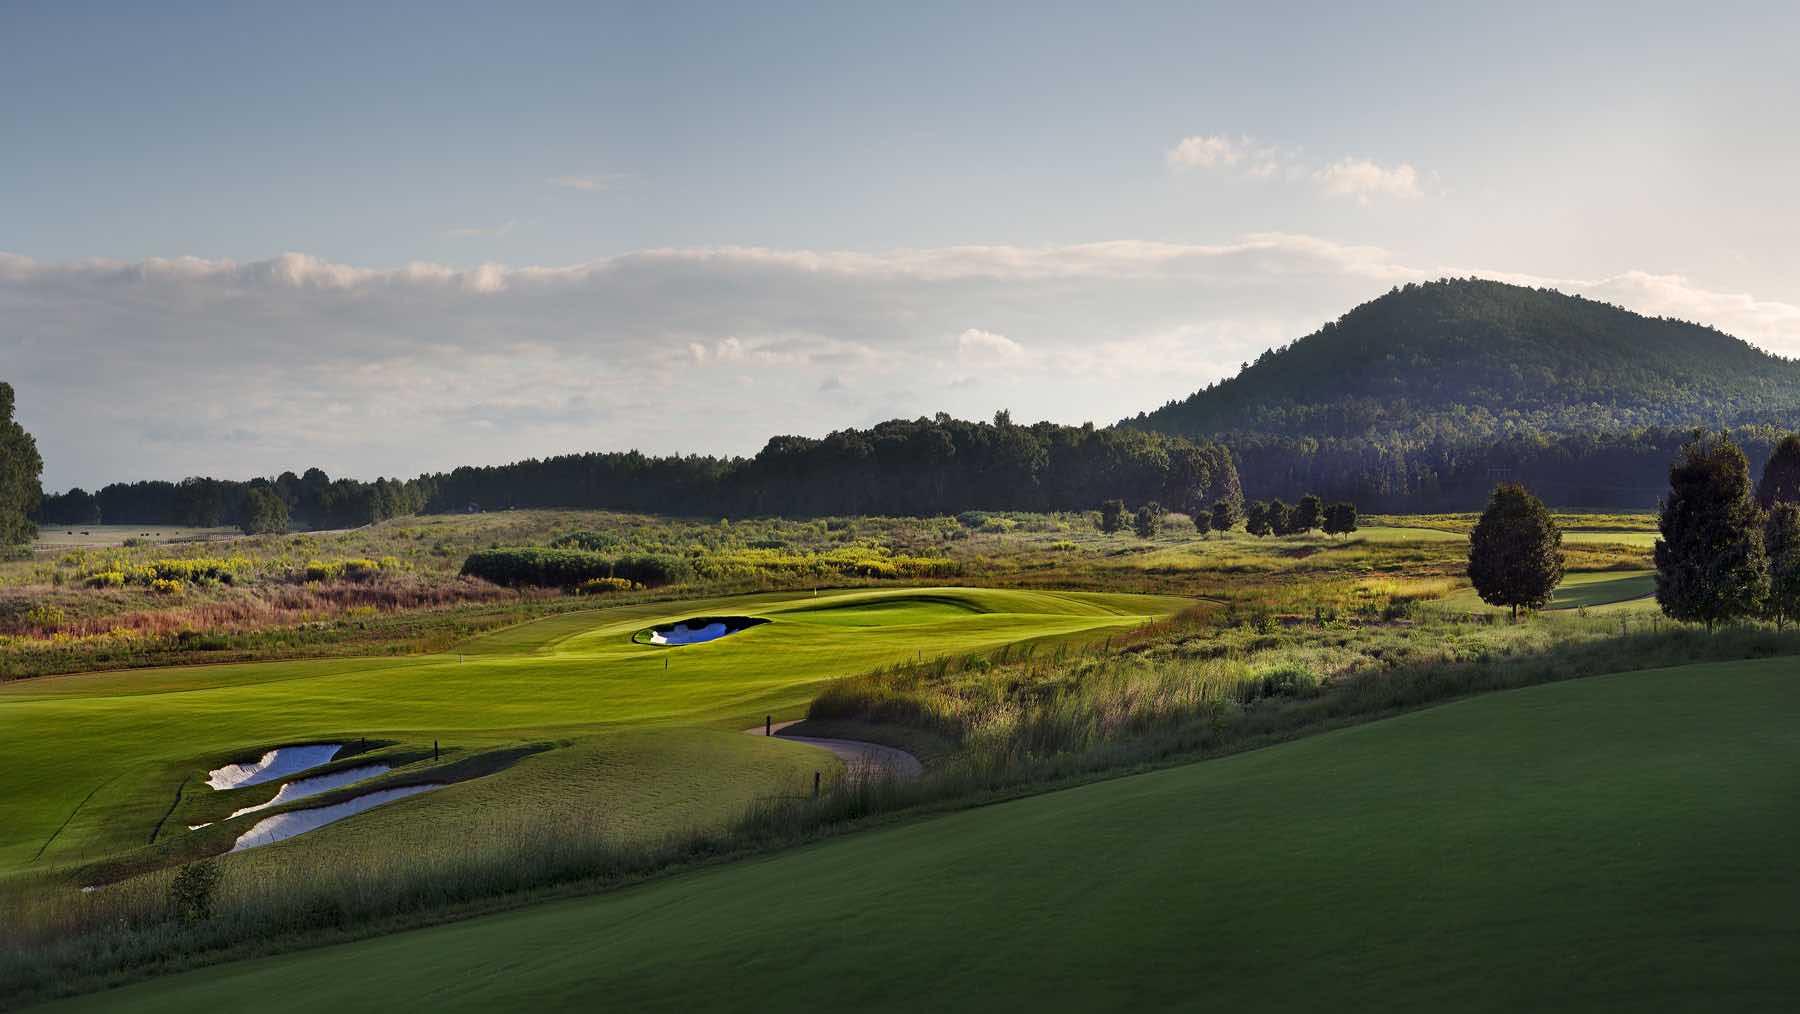 Alabama Resort and Destination Golf Course  Pursell Farms